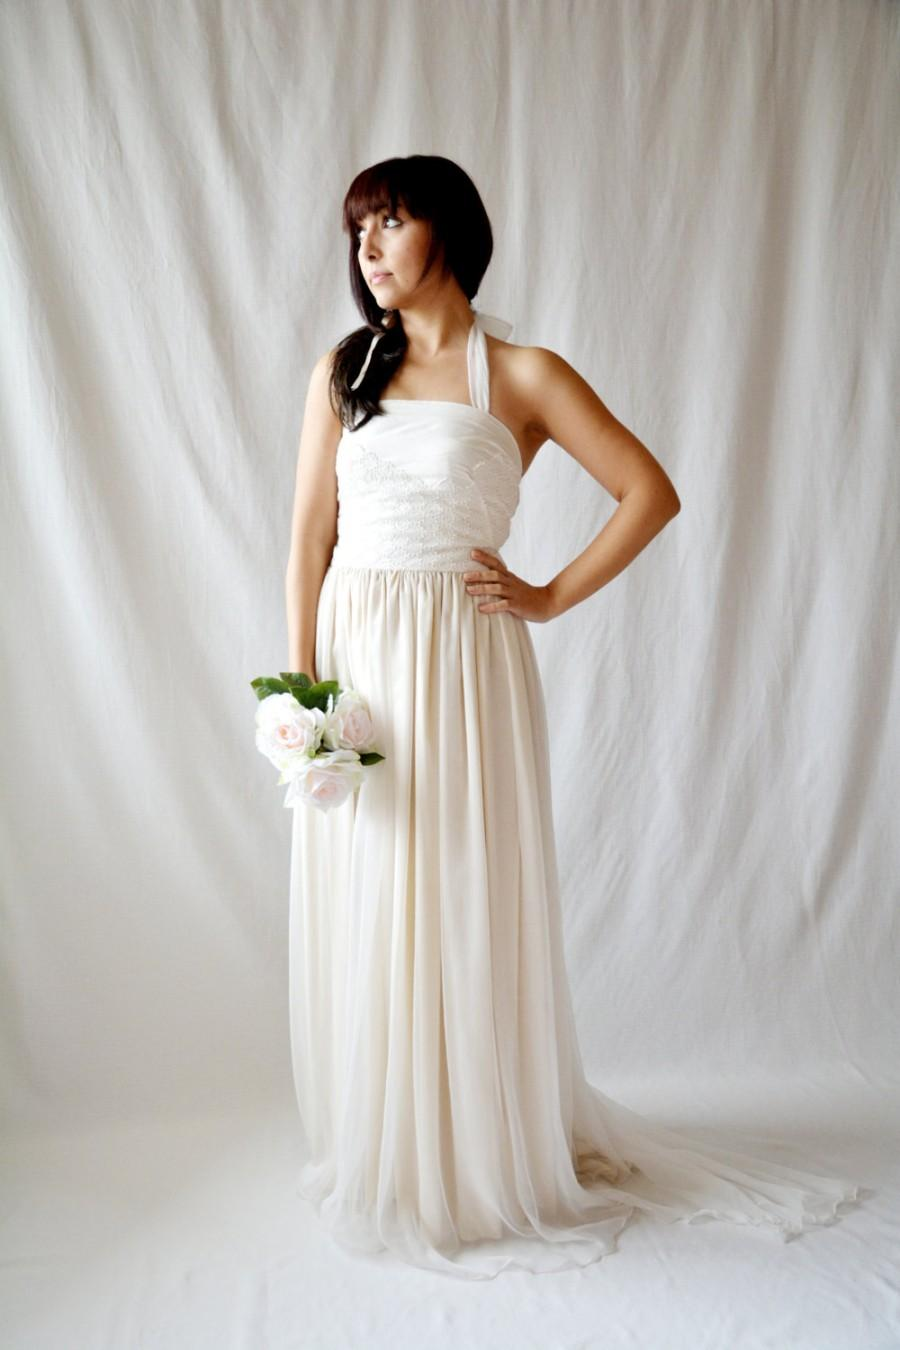 Свадьба - Rustic wedding dress, Silk wedding dress, Boho wedding dress, natural wedding dress, beach wedding dress, bridal gown, organic wedding dress